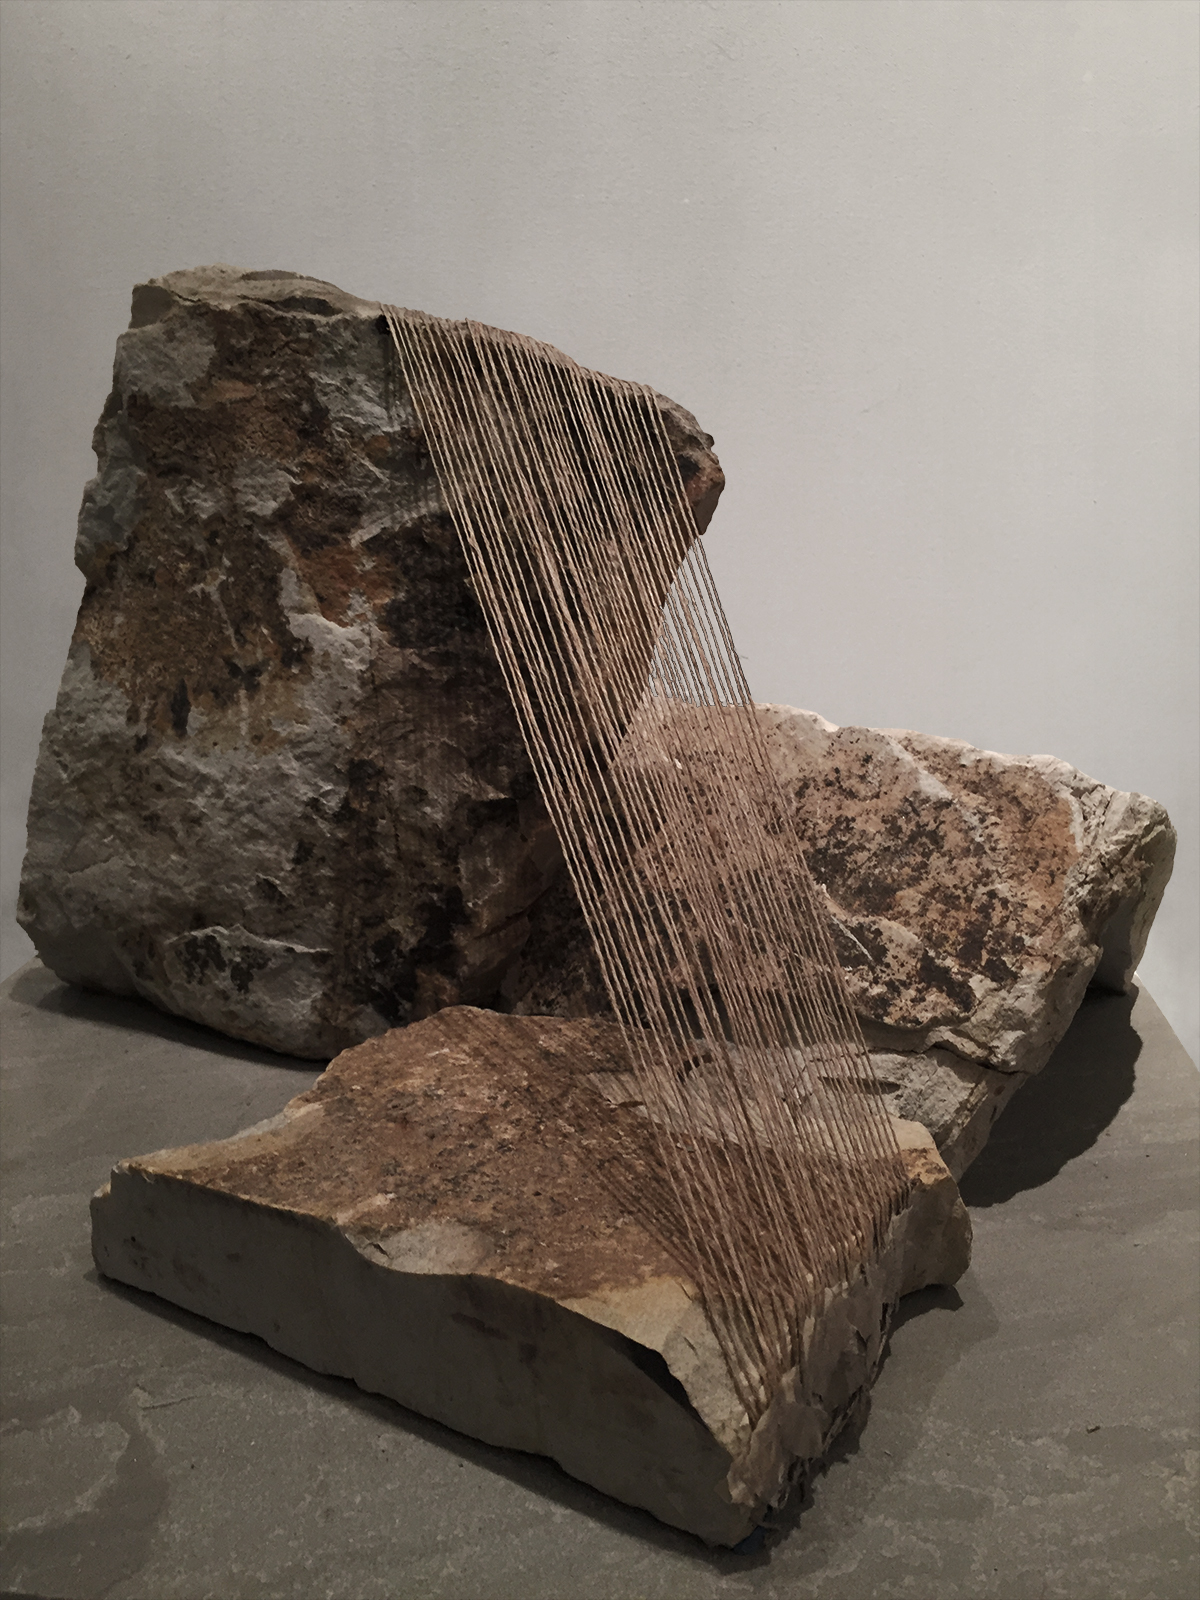 FRAGMENTED   Stone, thread  12 x 17.5 x 17.5 Inches